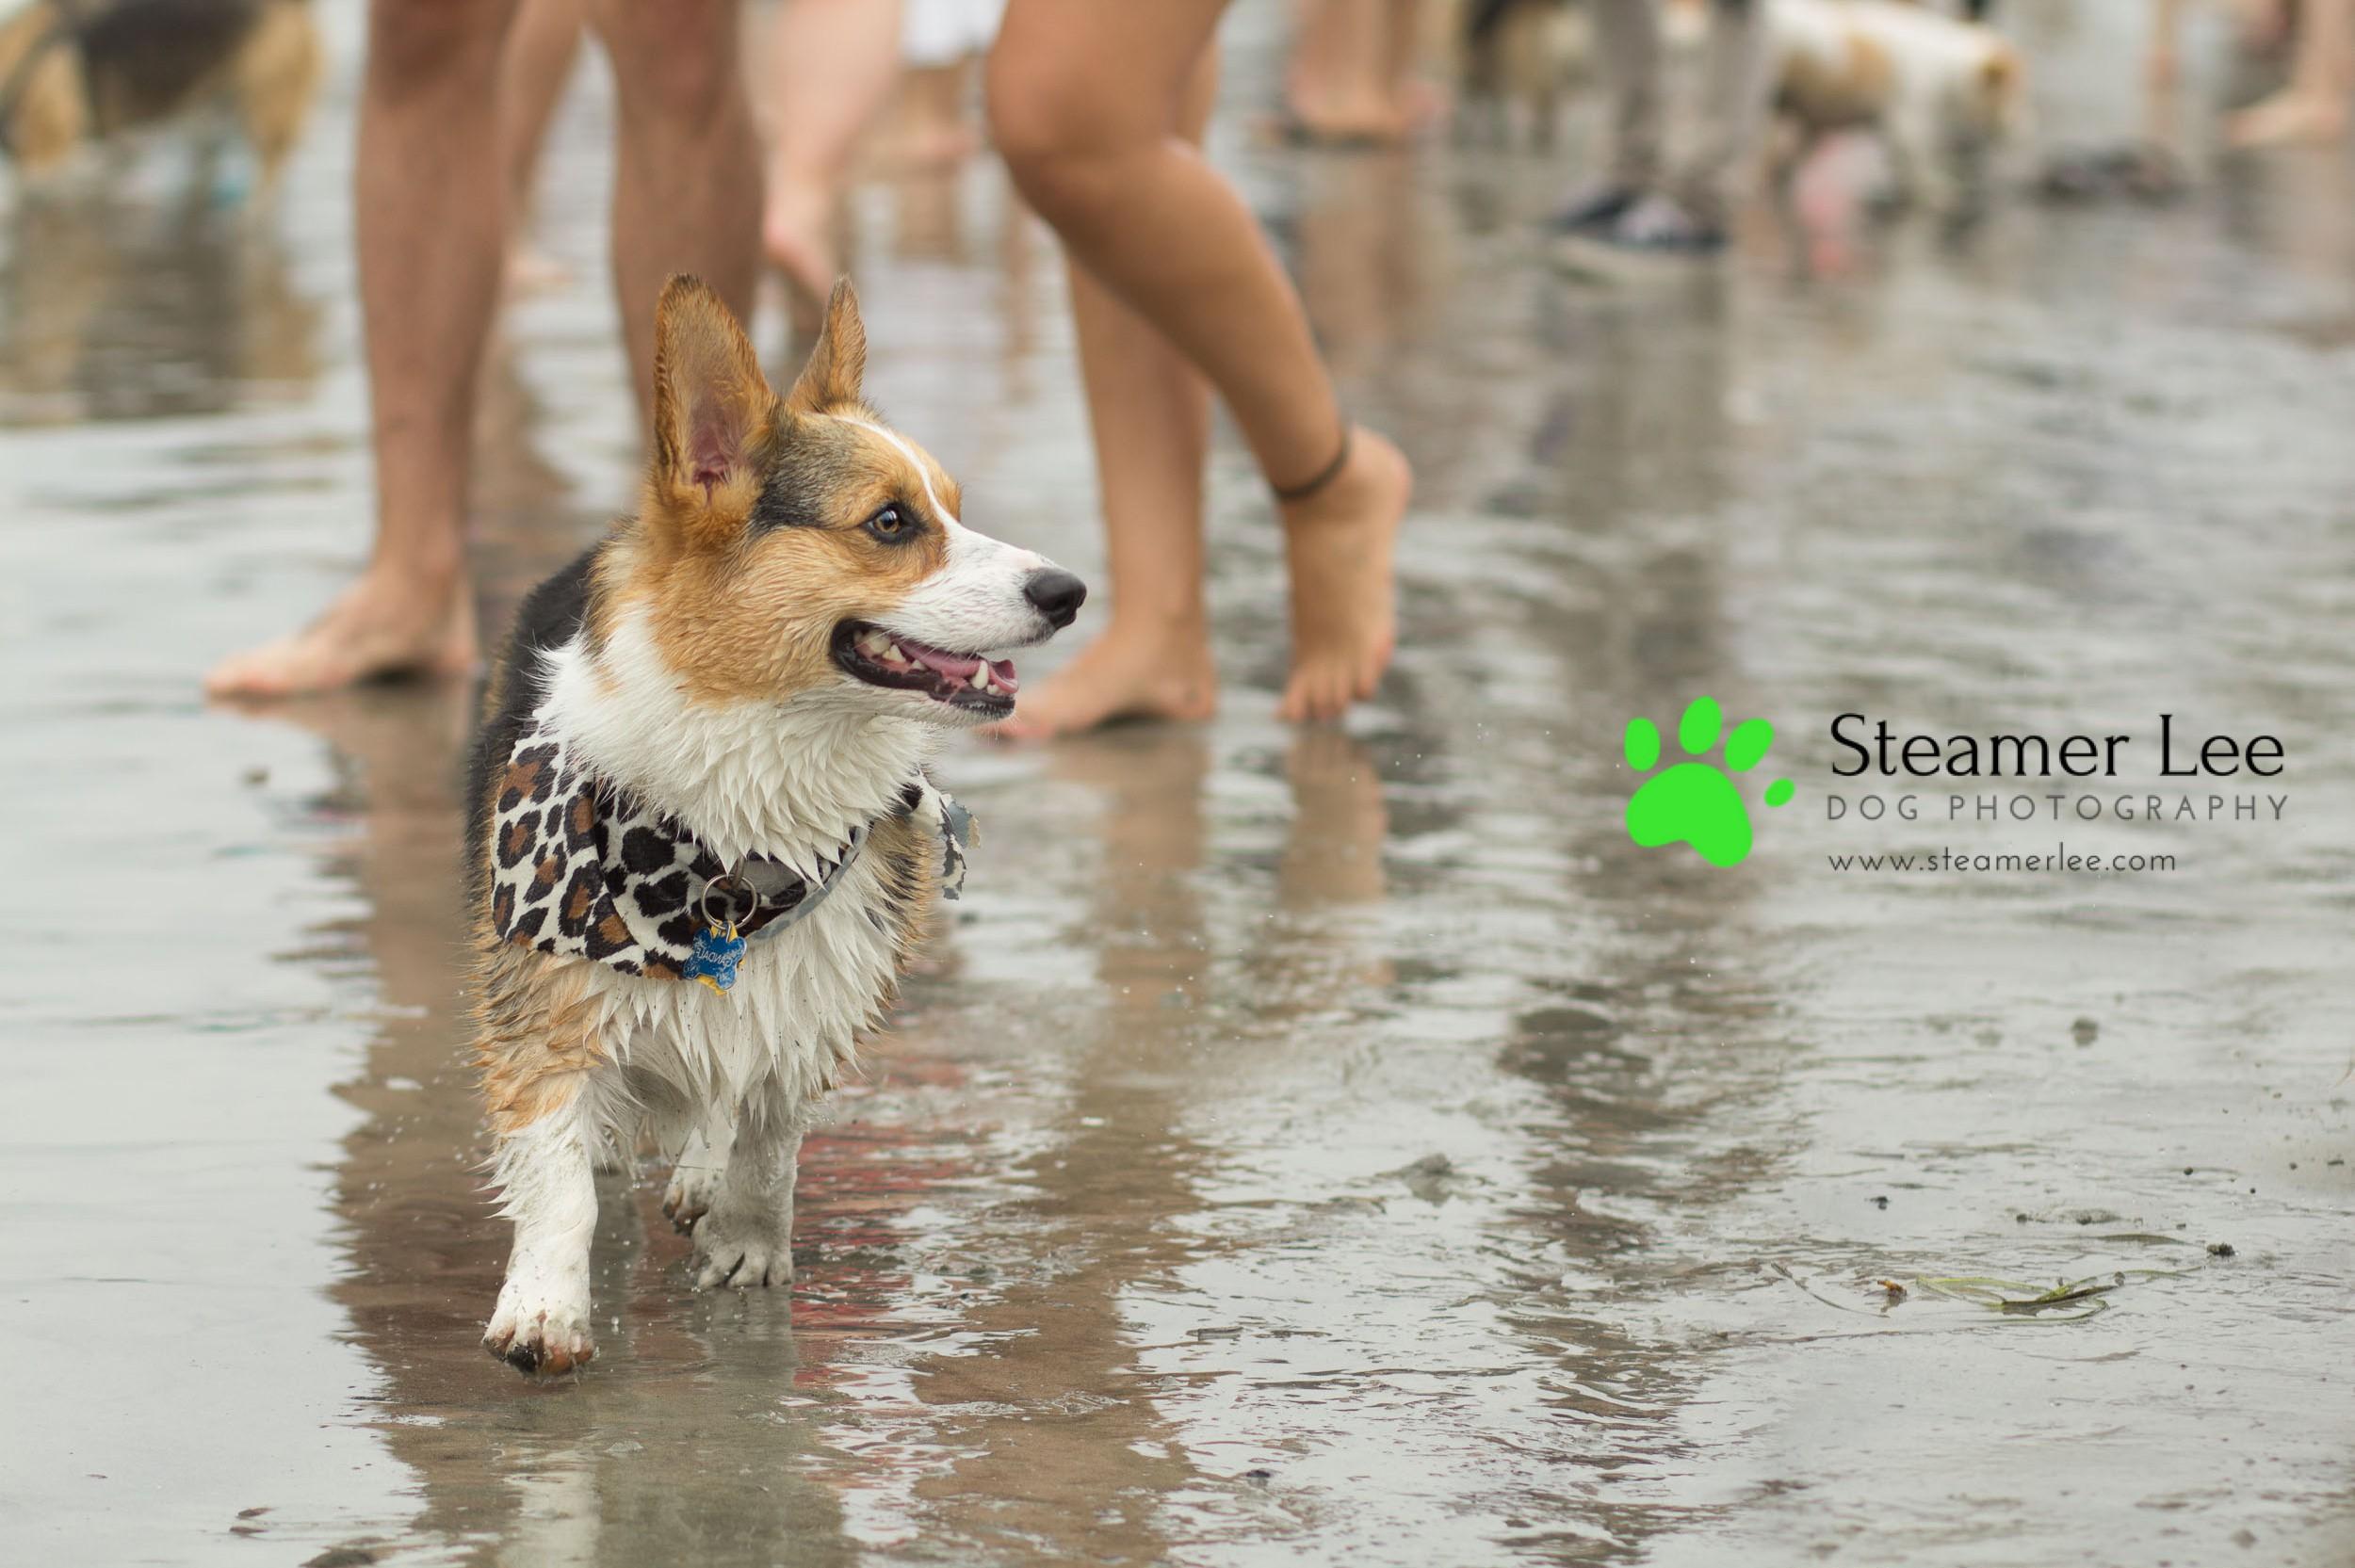 Steamer Lee Dog Photography - July 2017 So Cal Corgi Beach Day - Vol.2 - 3.jpg